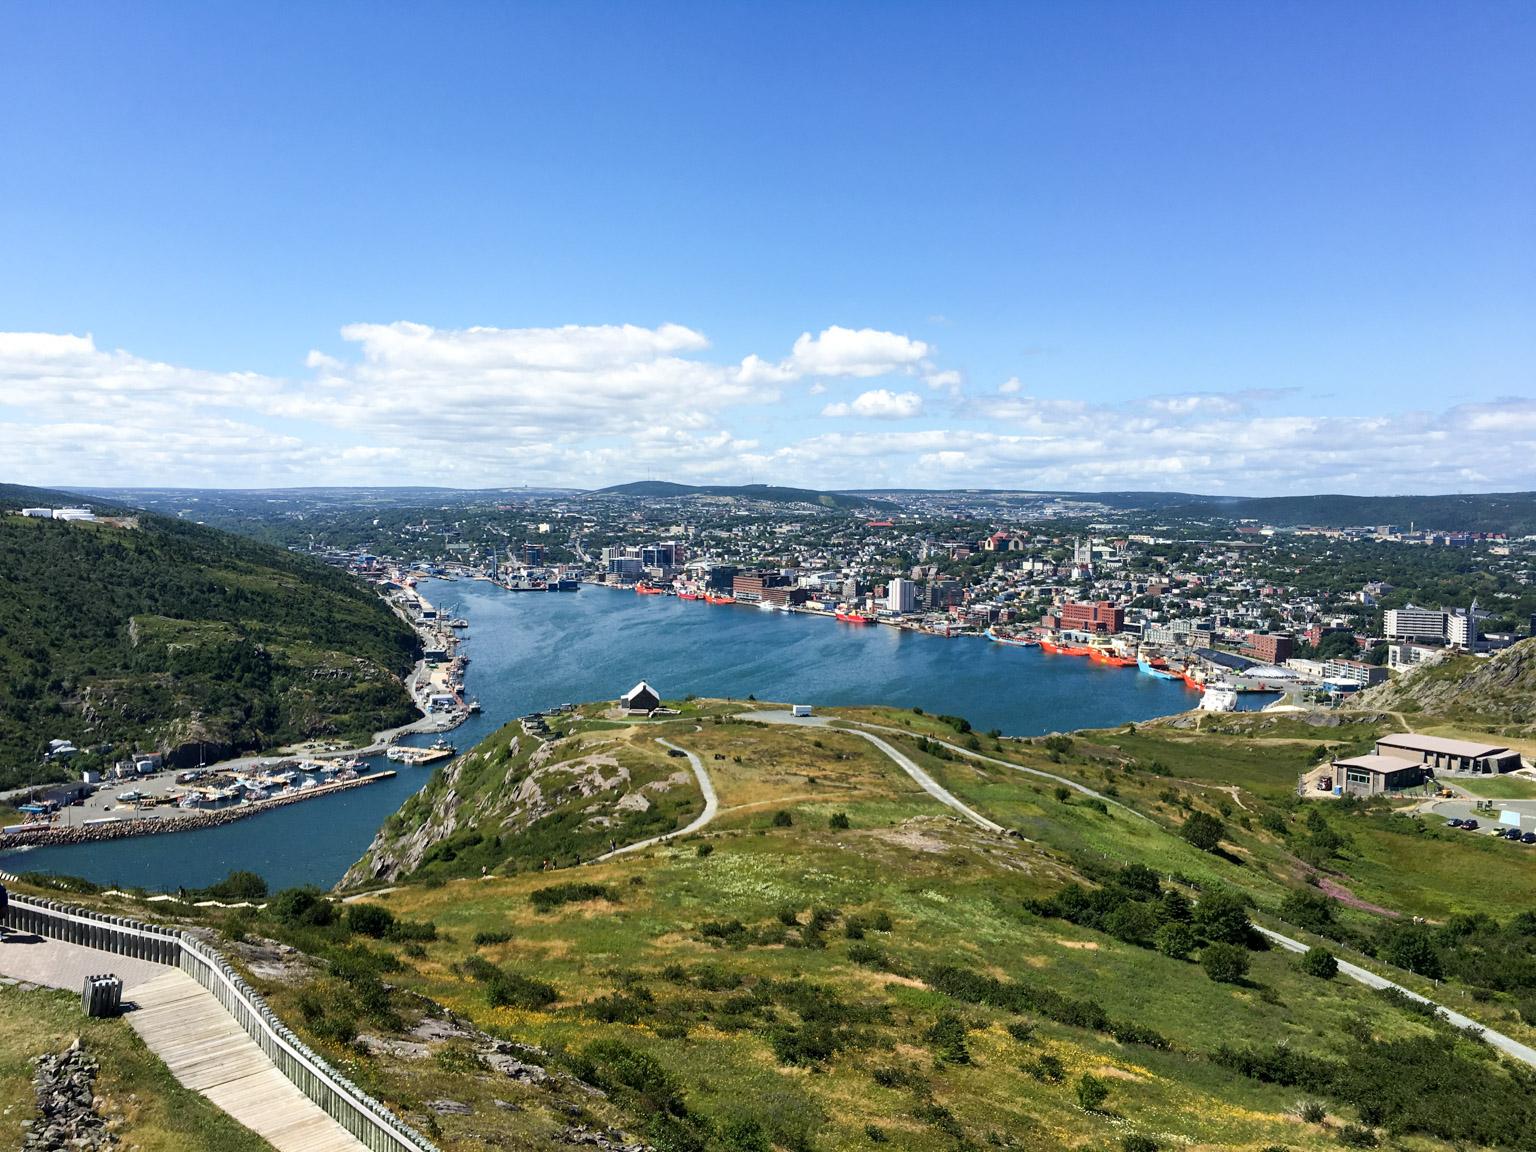 St John S Newfoundland August 2016 Douglas Stebila